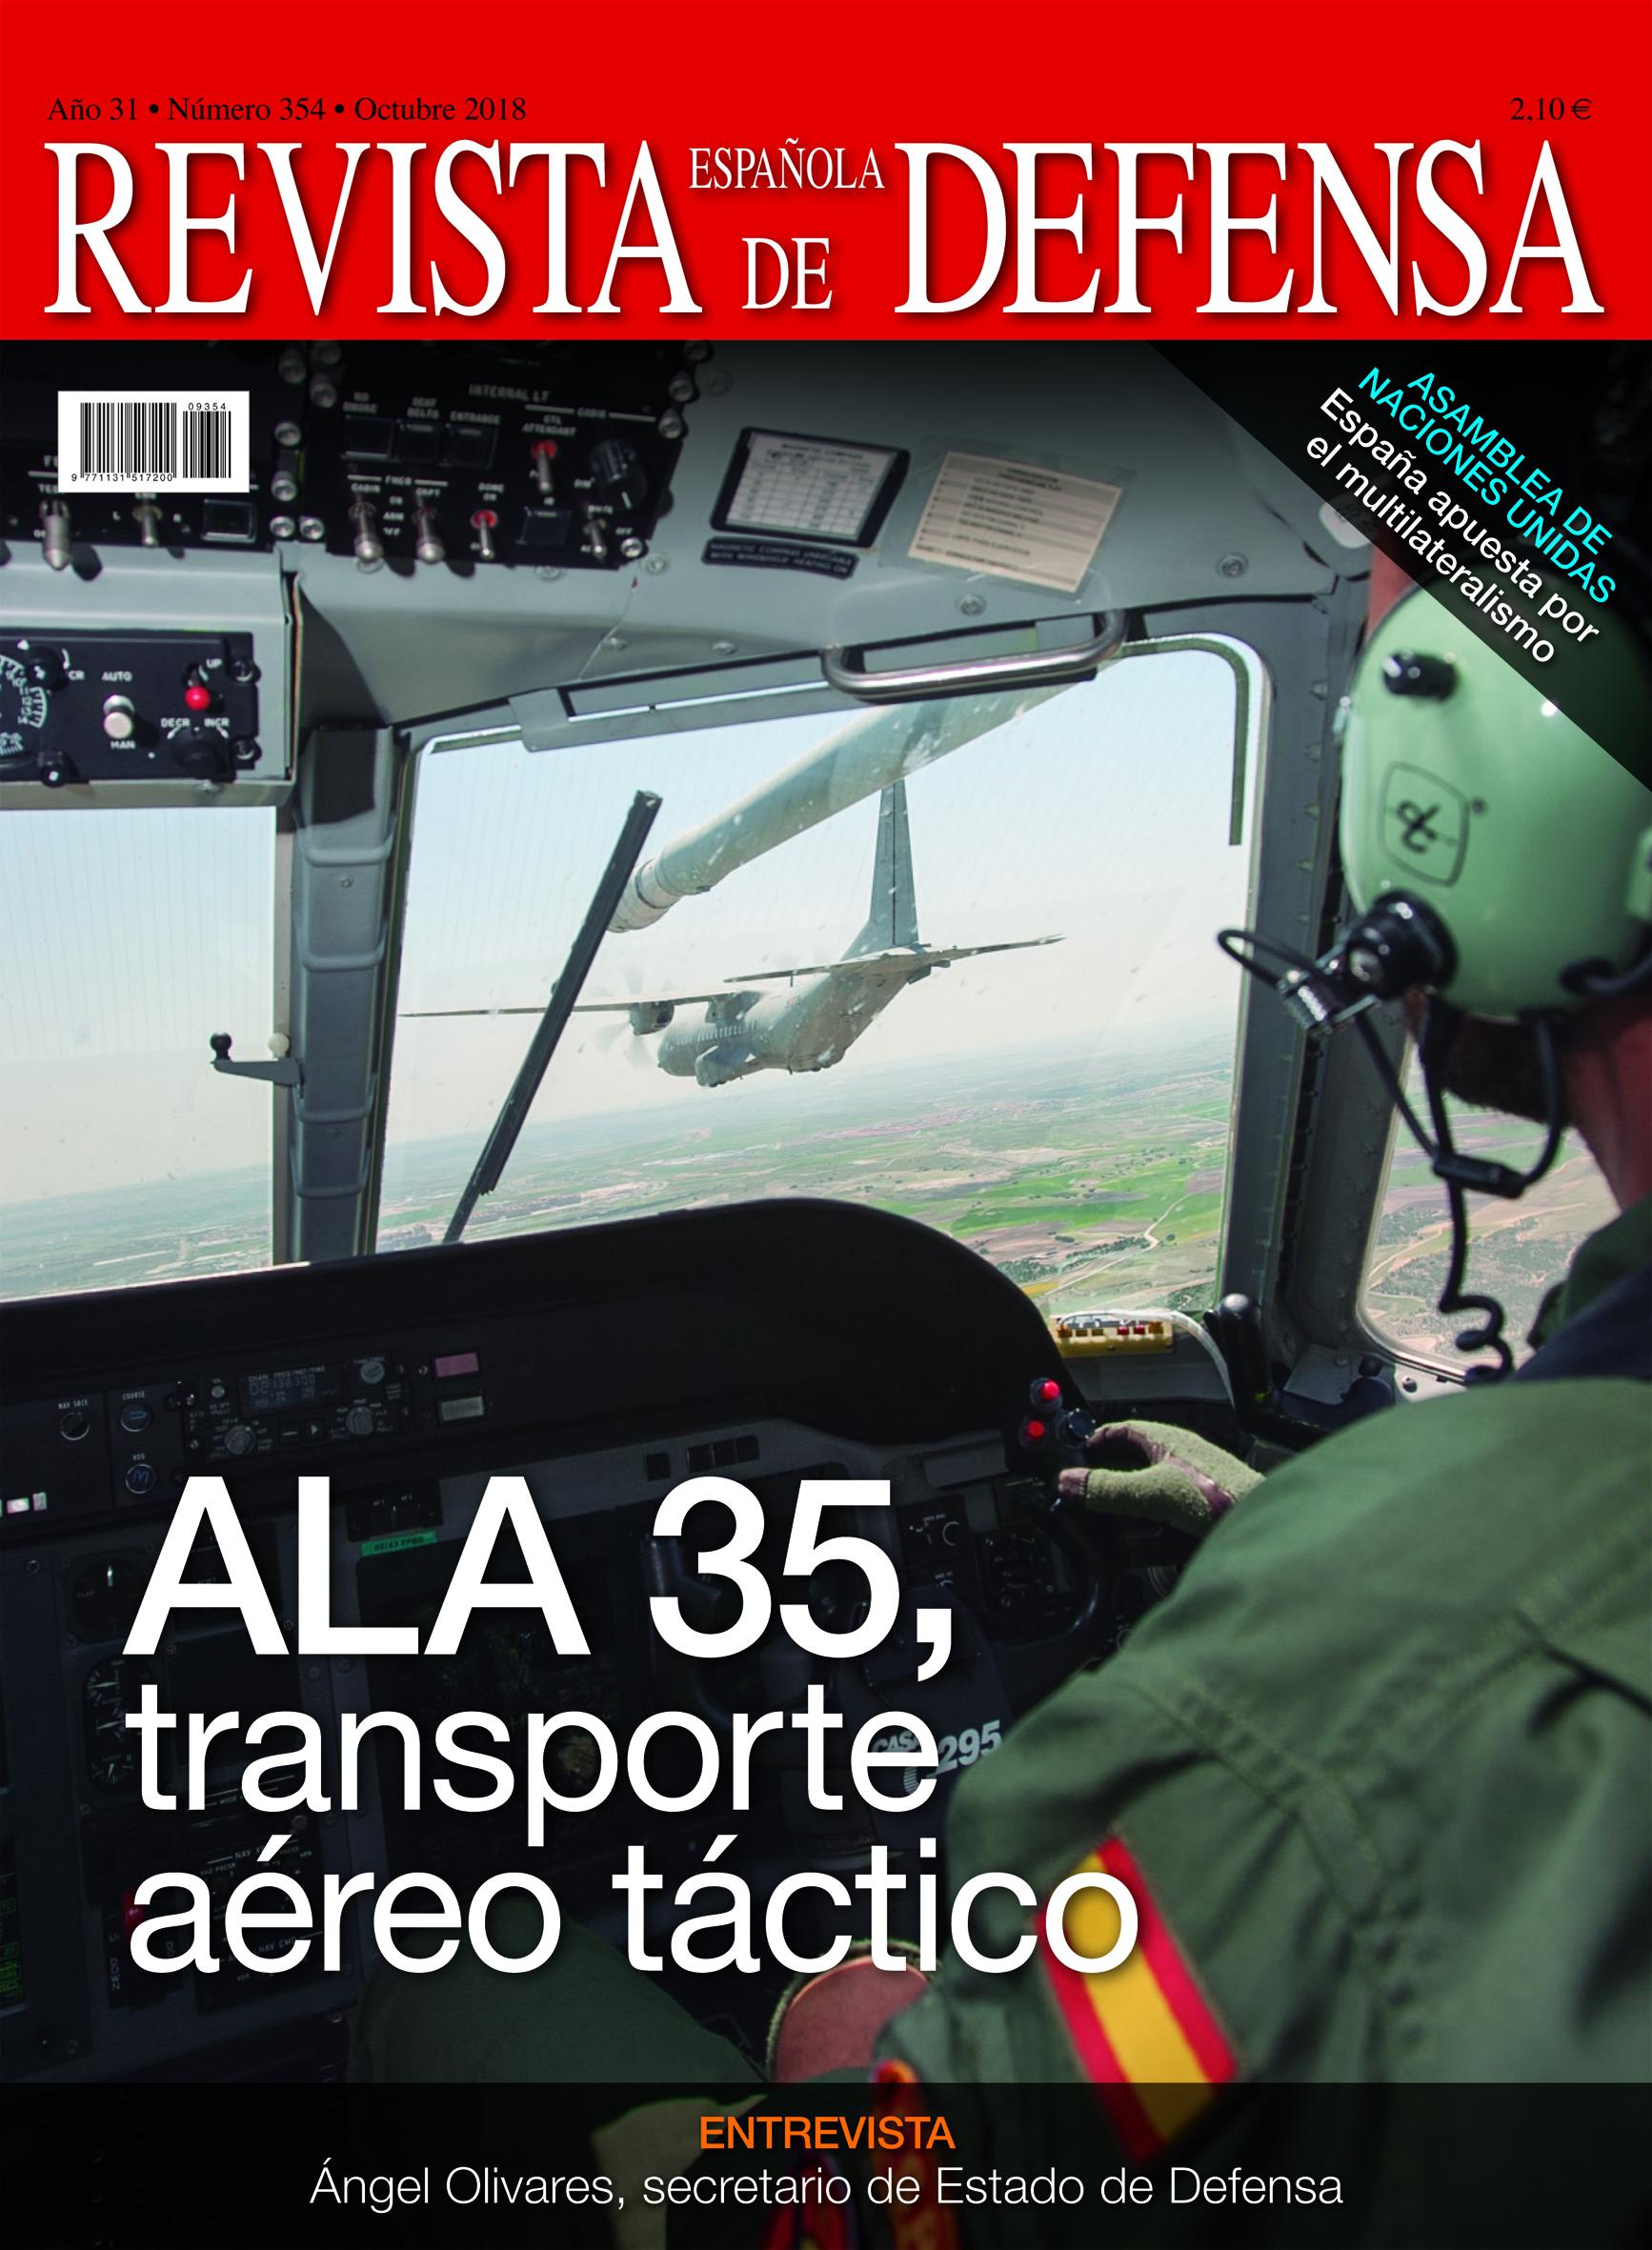 Ala 35, transporte aéreo táctico. RED 354